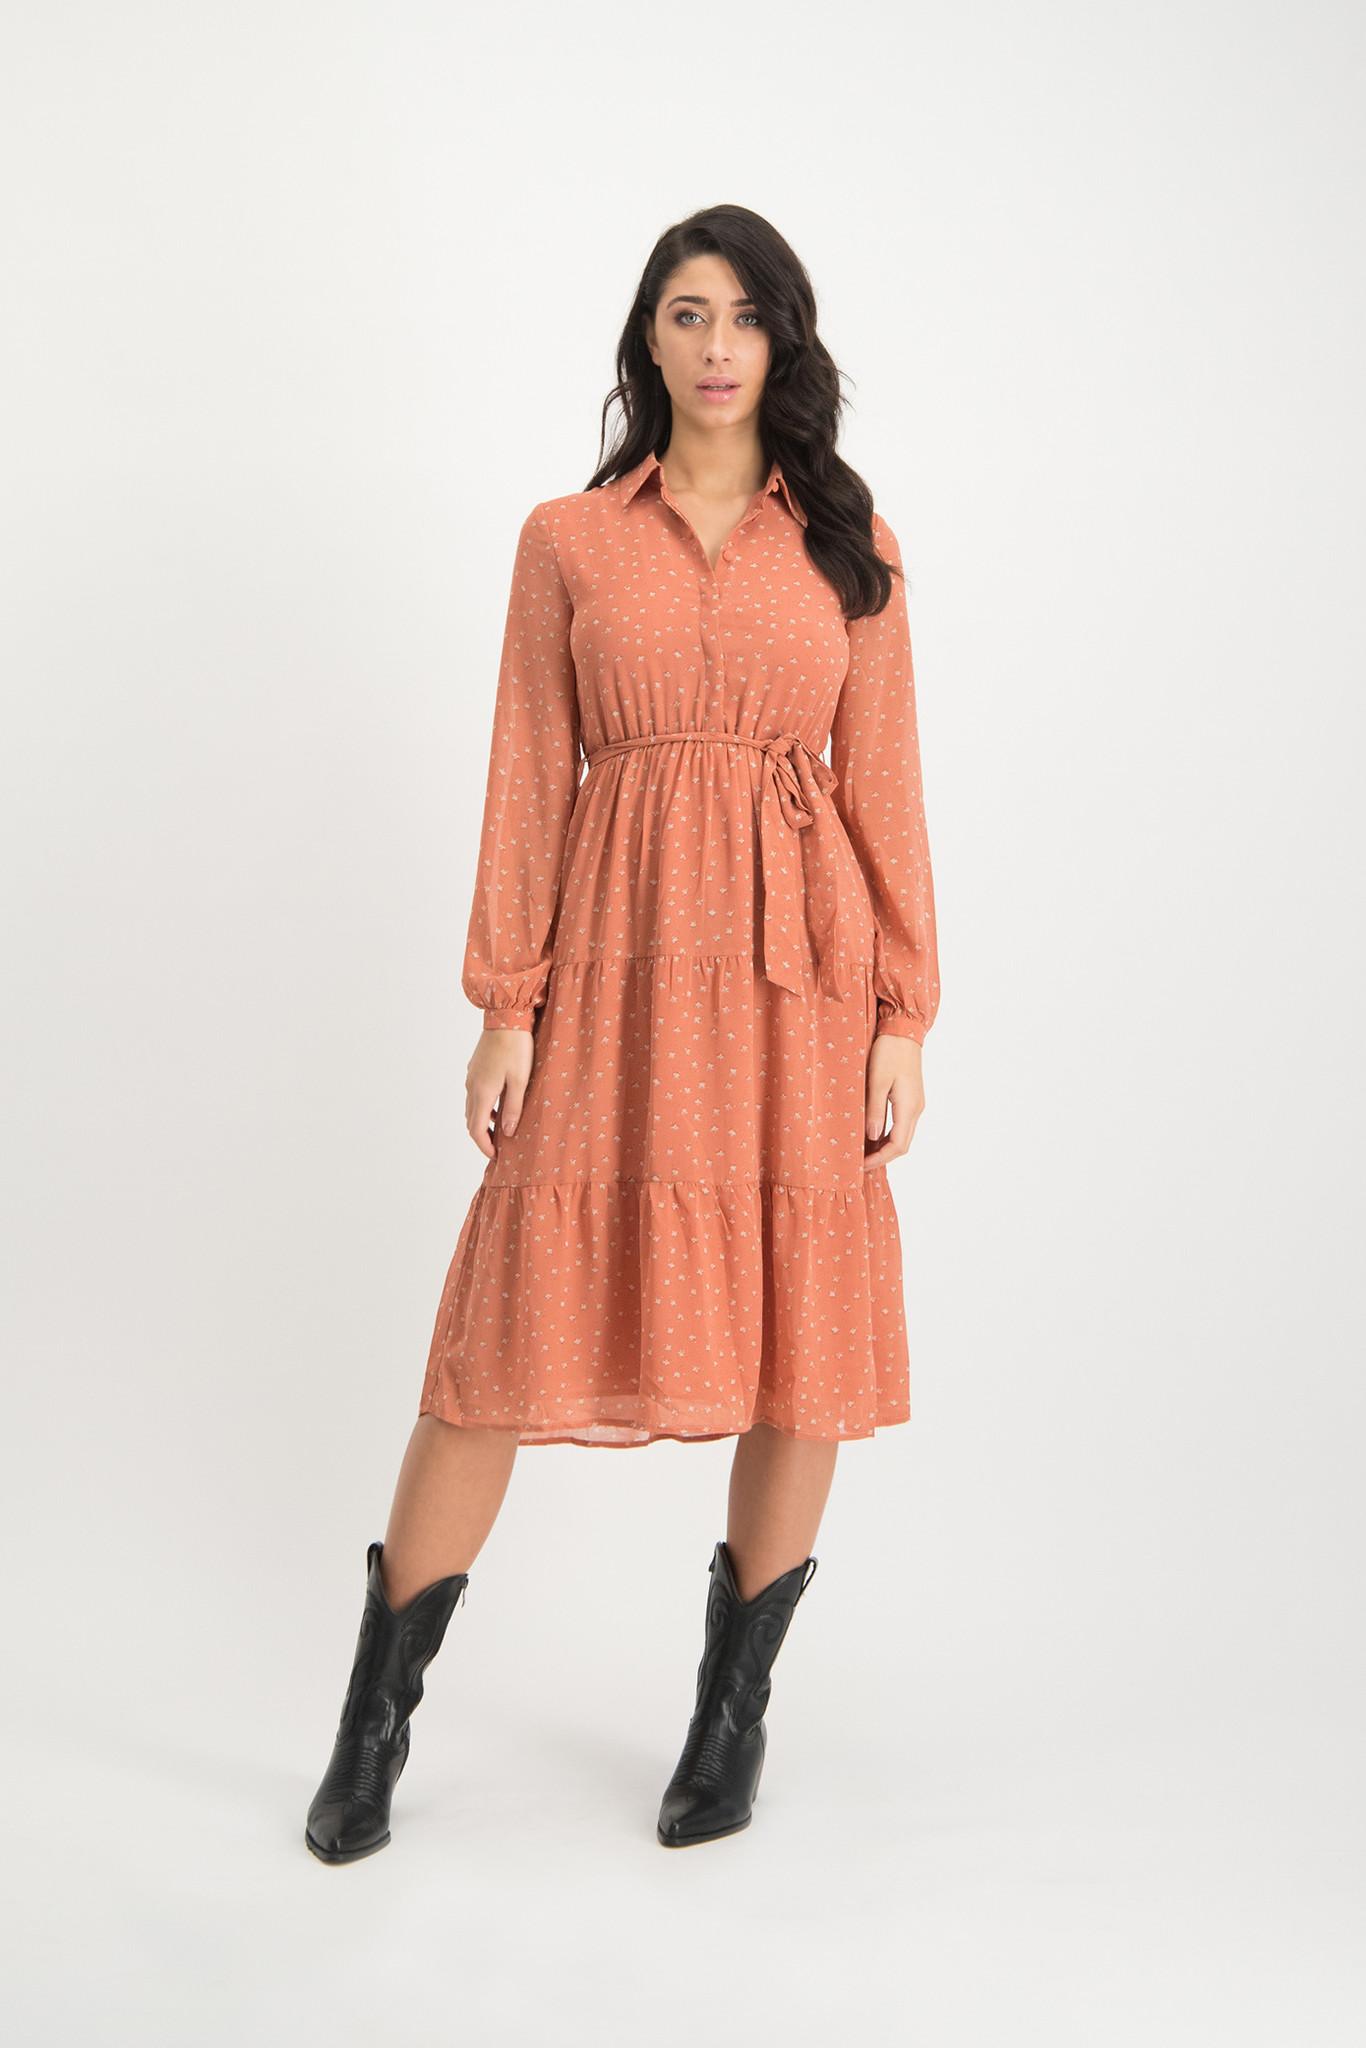 Lofty Manner Peach-colored Midi Dress Ellis